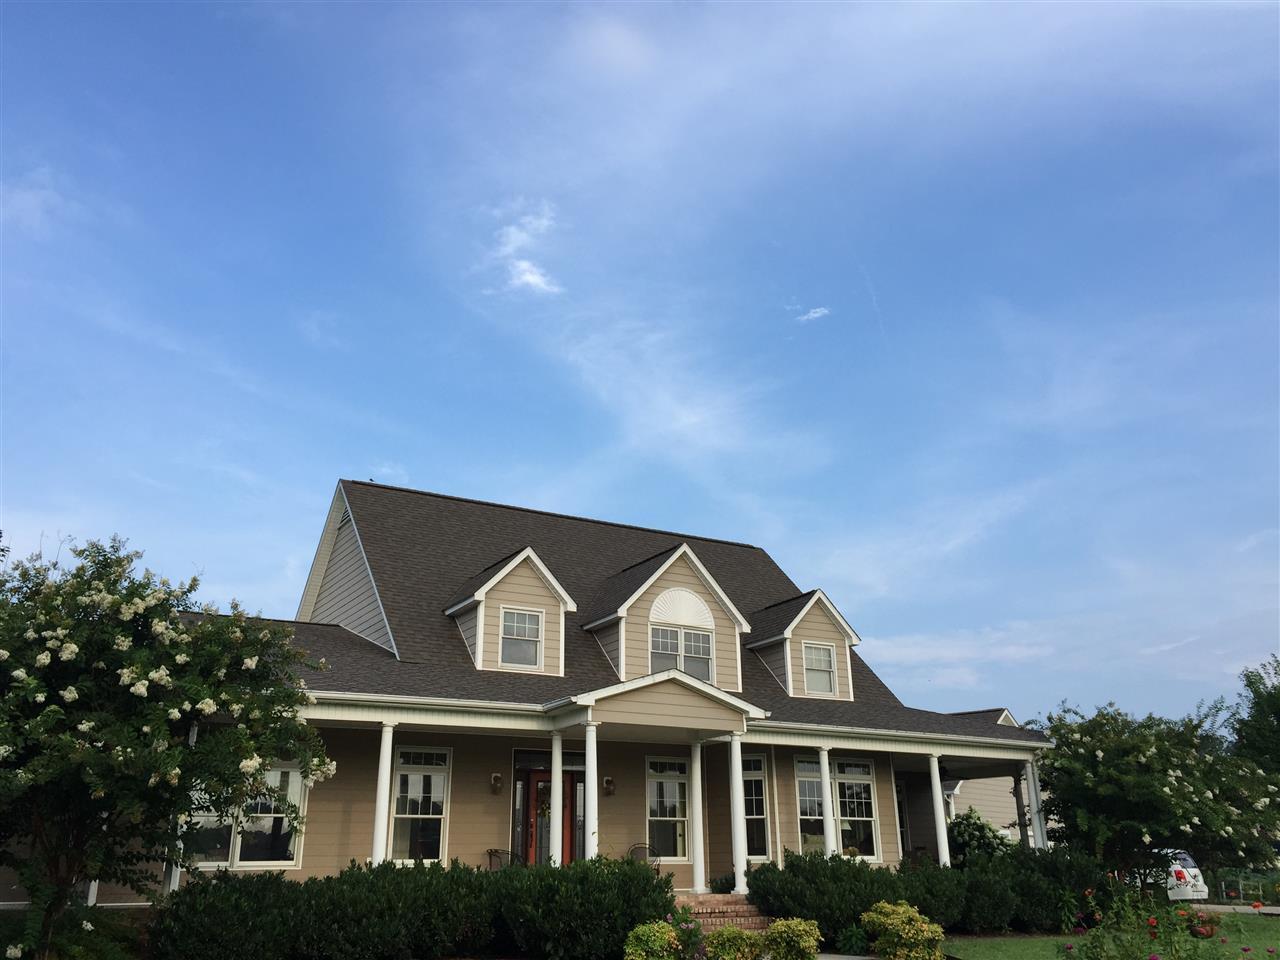 Real Estate for Sale, ListingId: 36905448, Benton,KY42025